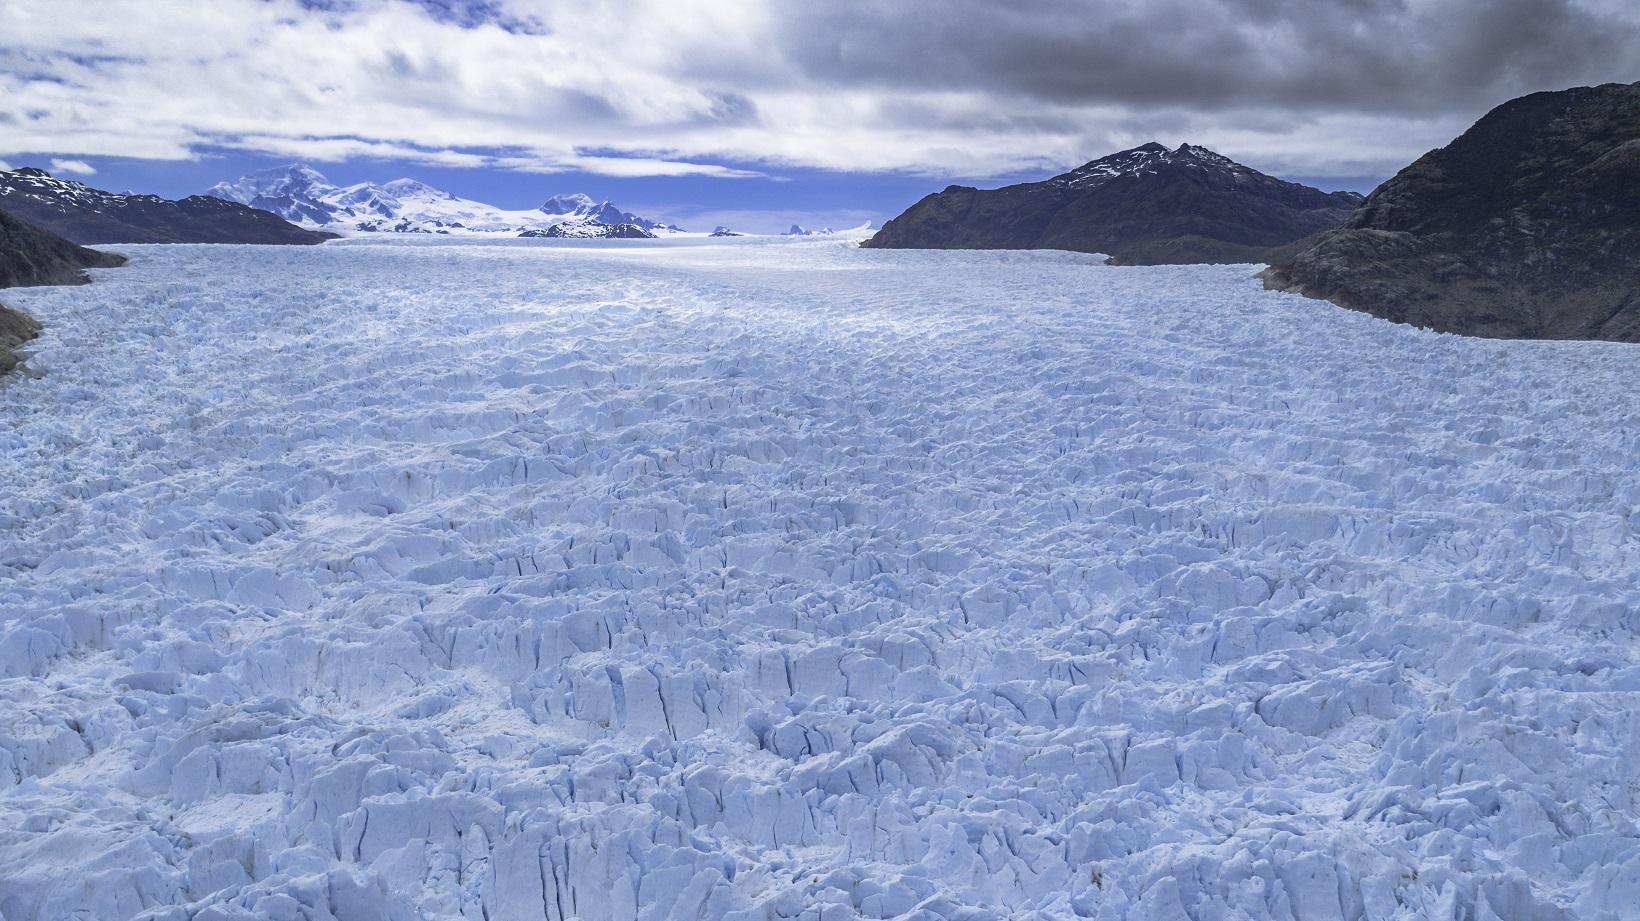 Vista aérea Glaciar San Rafael